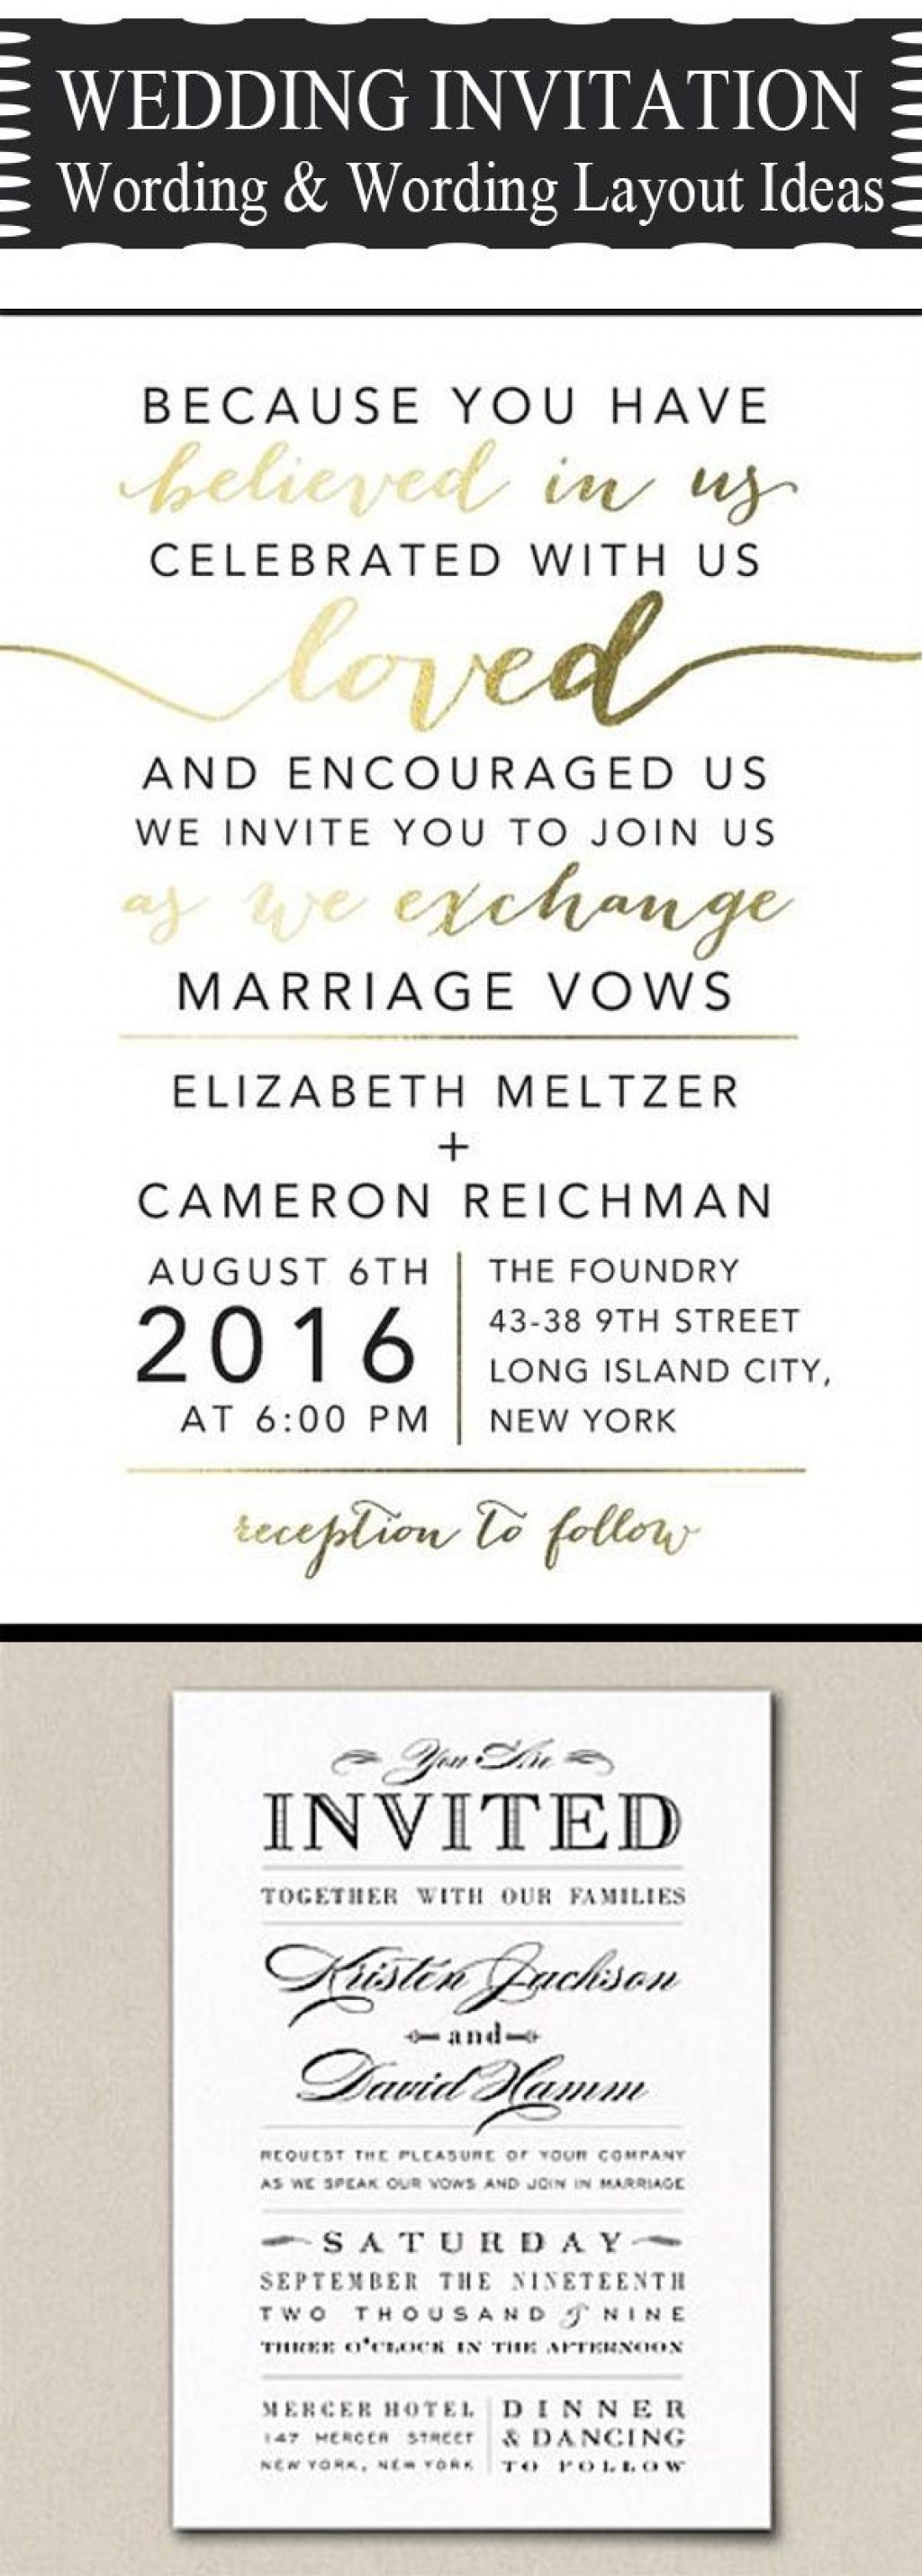 007 Rare Formal Wedding Invitation Wording Template Sample  TemplatesLarge